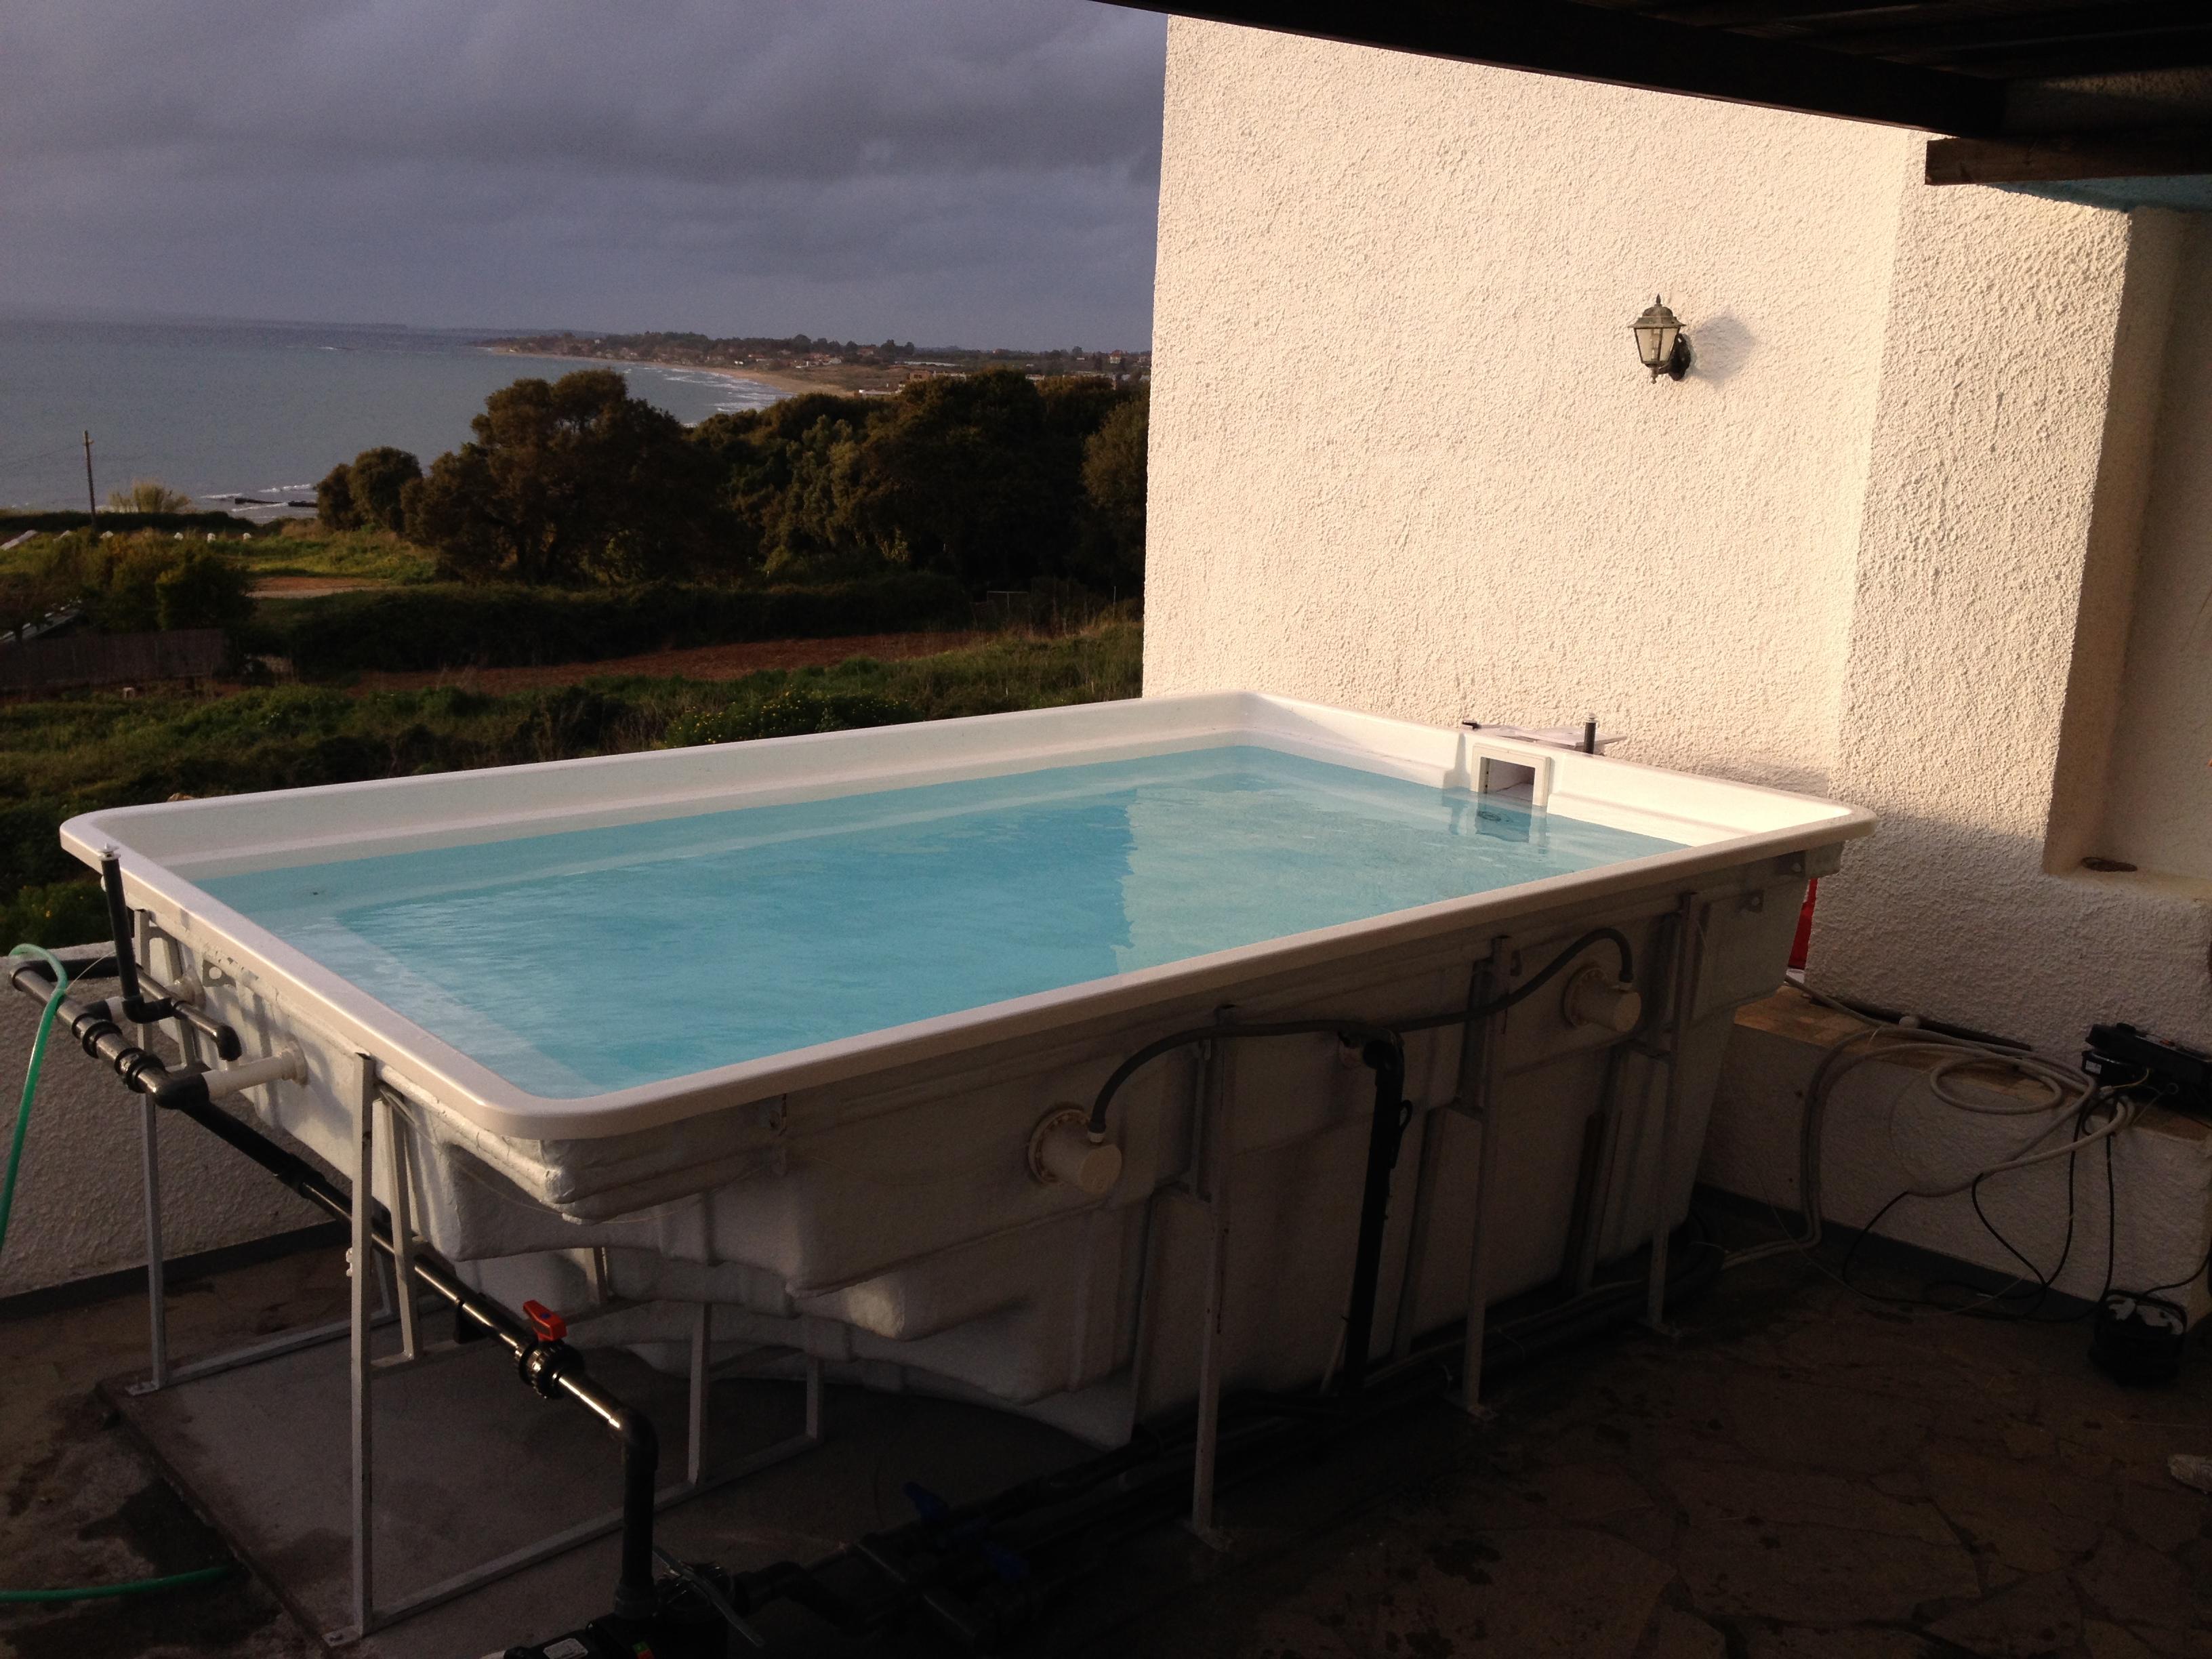 Pool plus spa ypsilon prefabricated swimming pool spa for Prefabricated pools